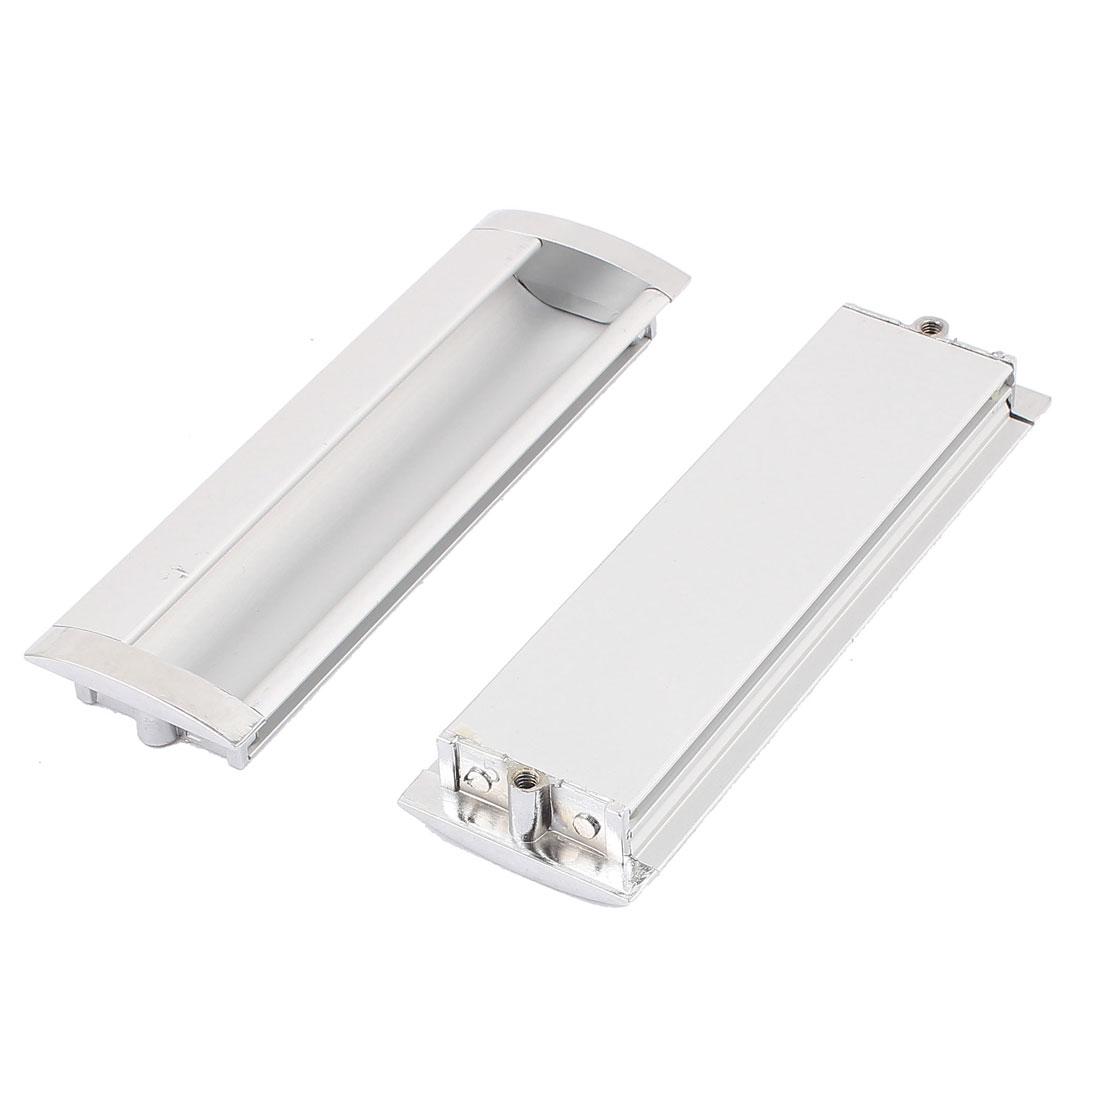 Rectangular Recessed Flush Pulls Drawer Sliding Door Handle Silver Tone 140x43mm